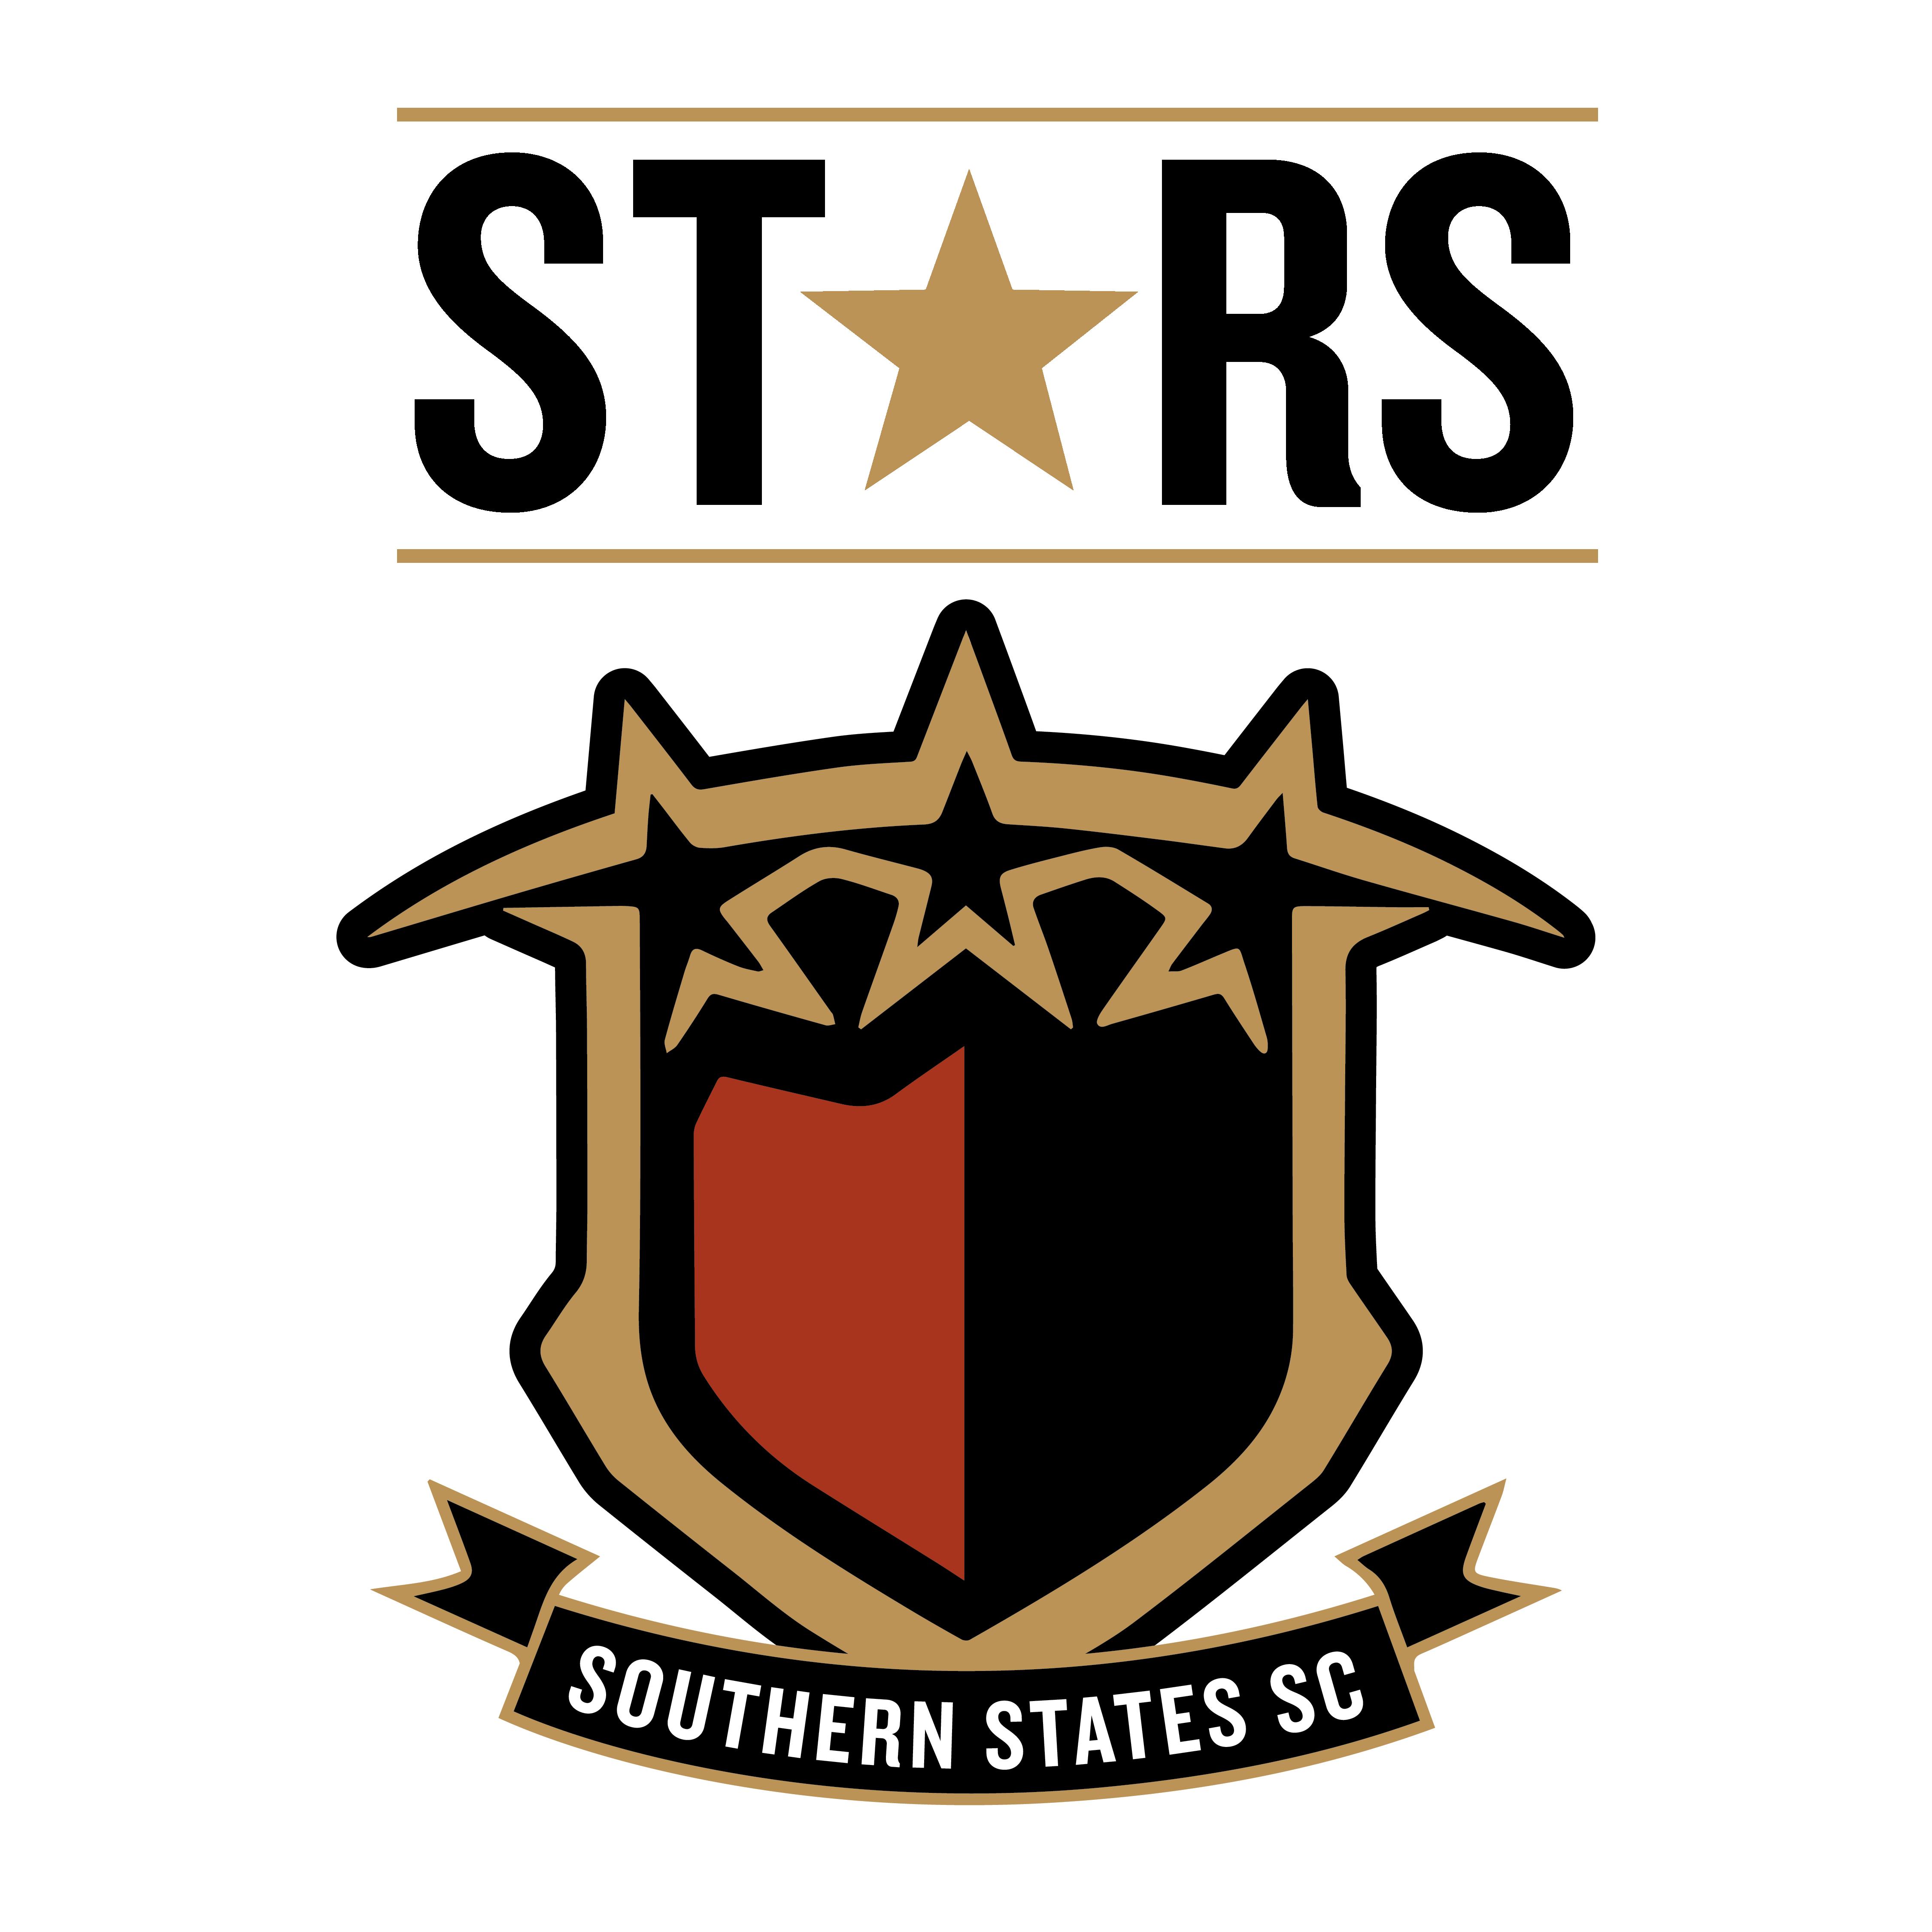 Southern States SC Stars U-19